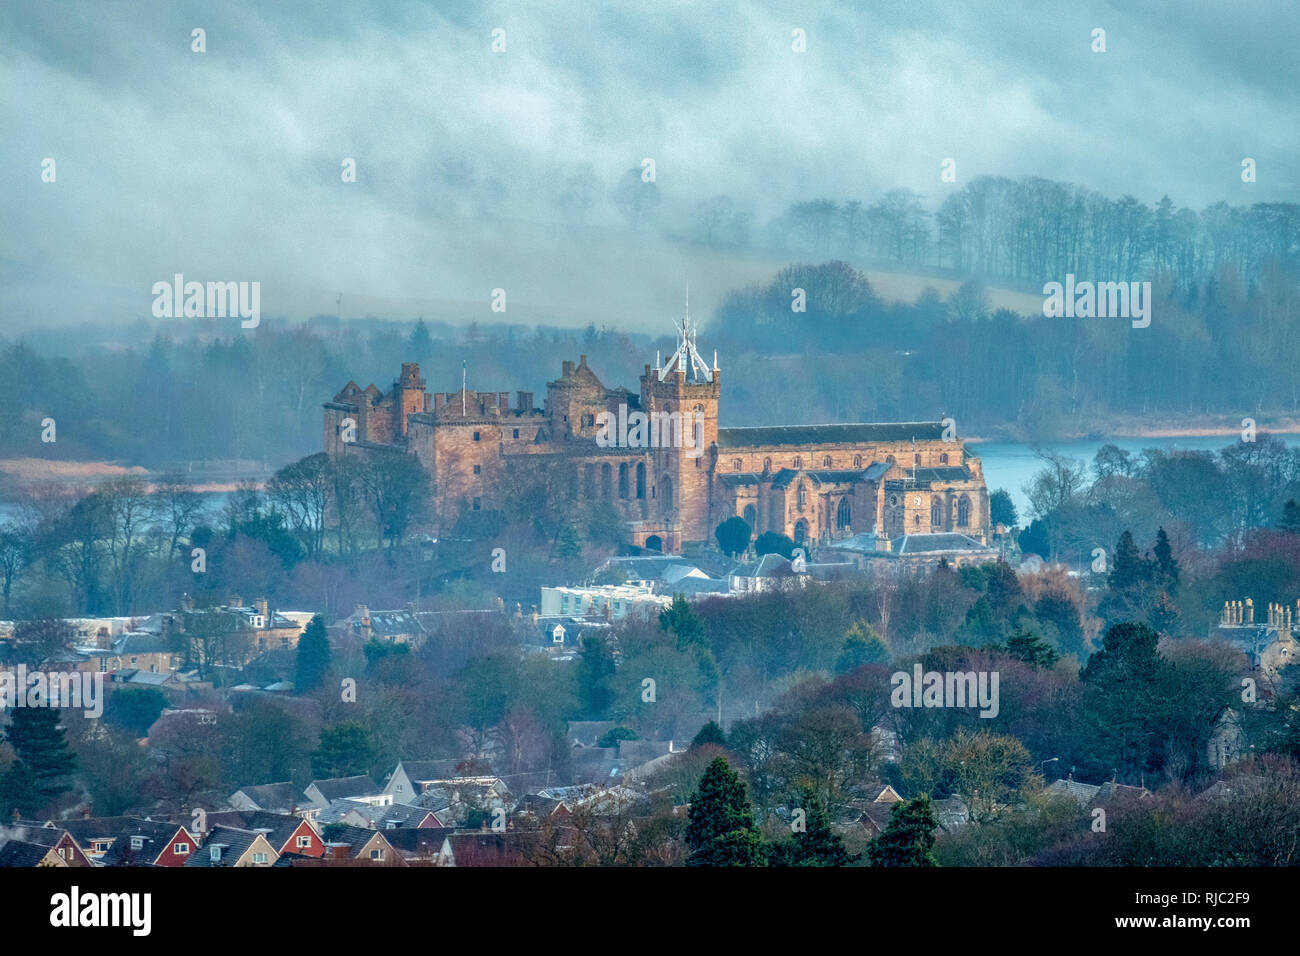 Linlithgow Palace, Linlithgow, West Lothian, Scotland. Stock Photo